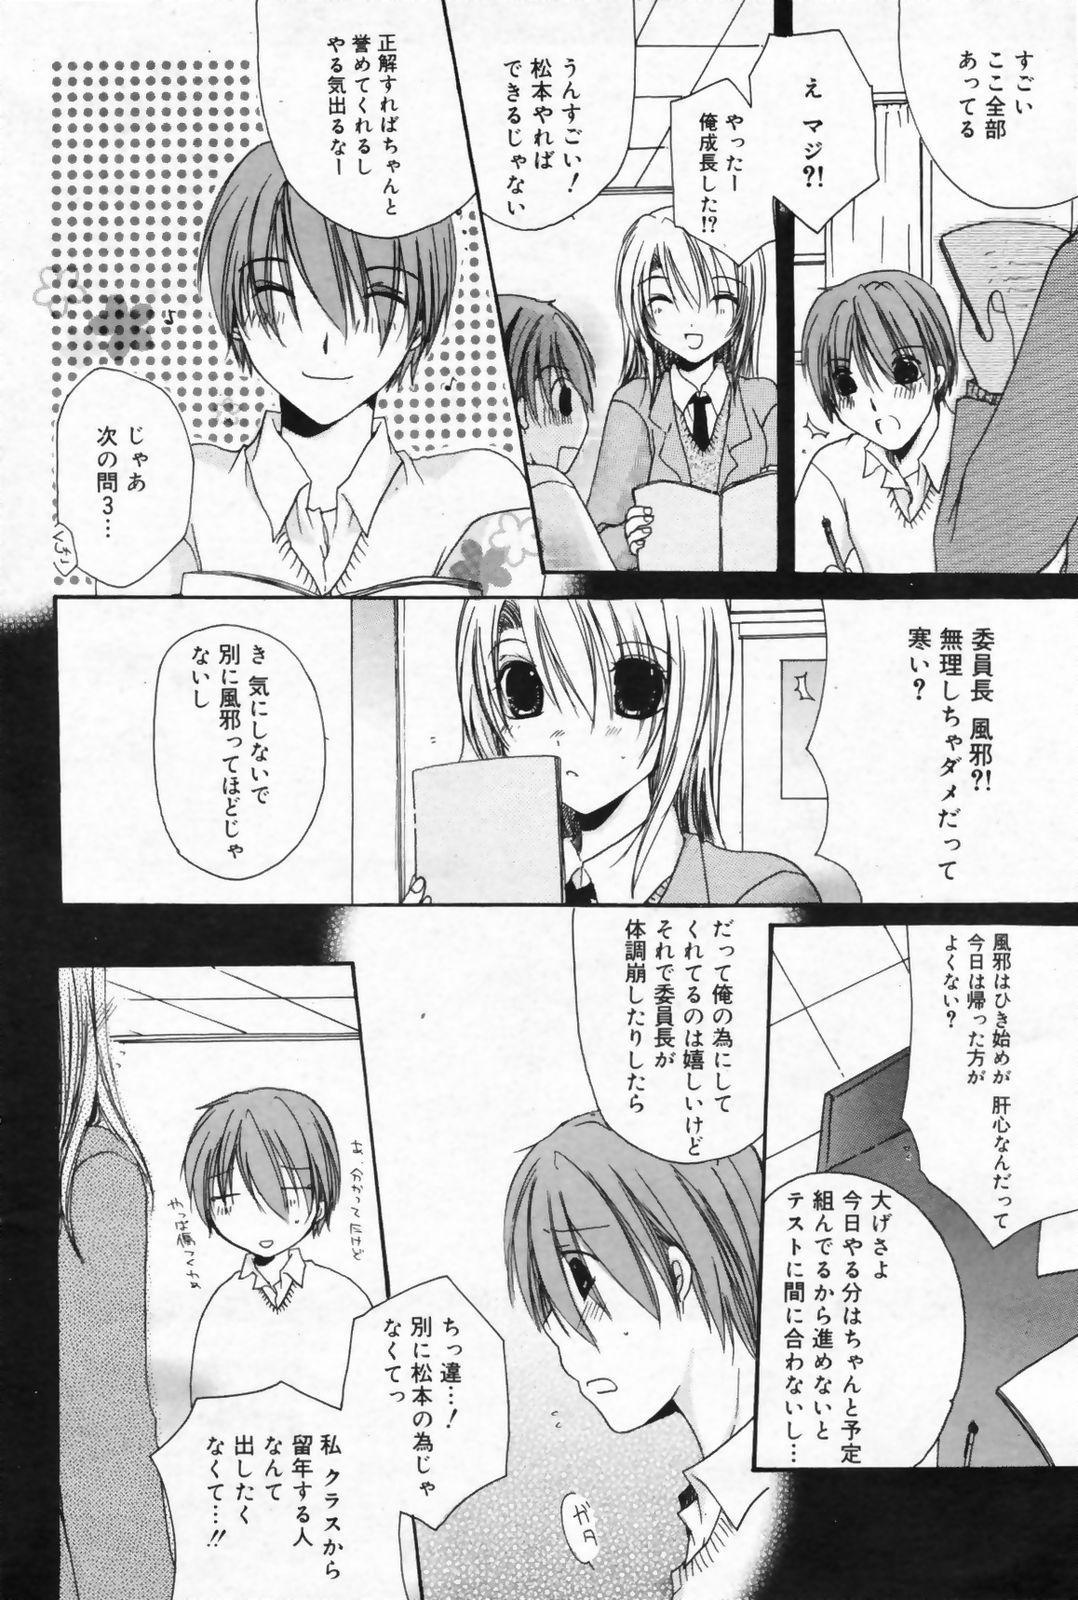 Manga Bangaichi 2009-02 Vol. 234 103